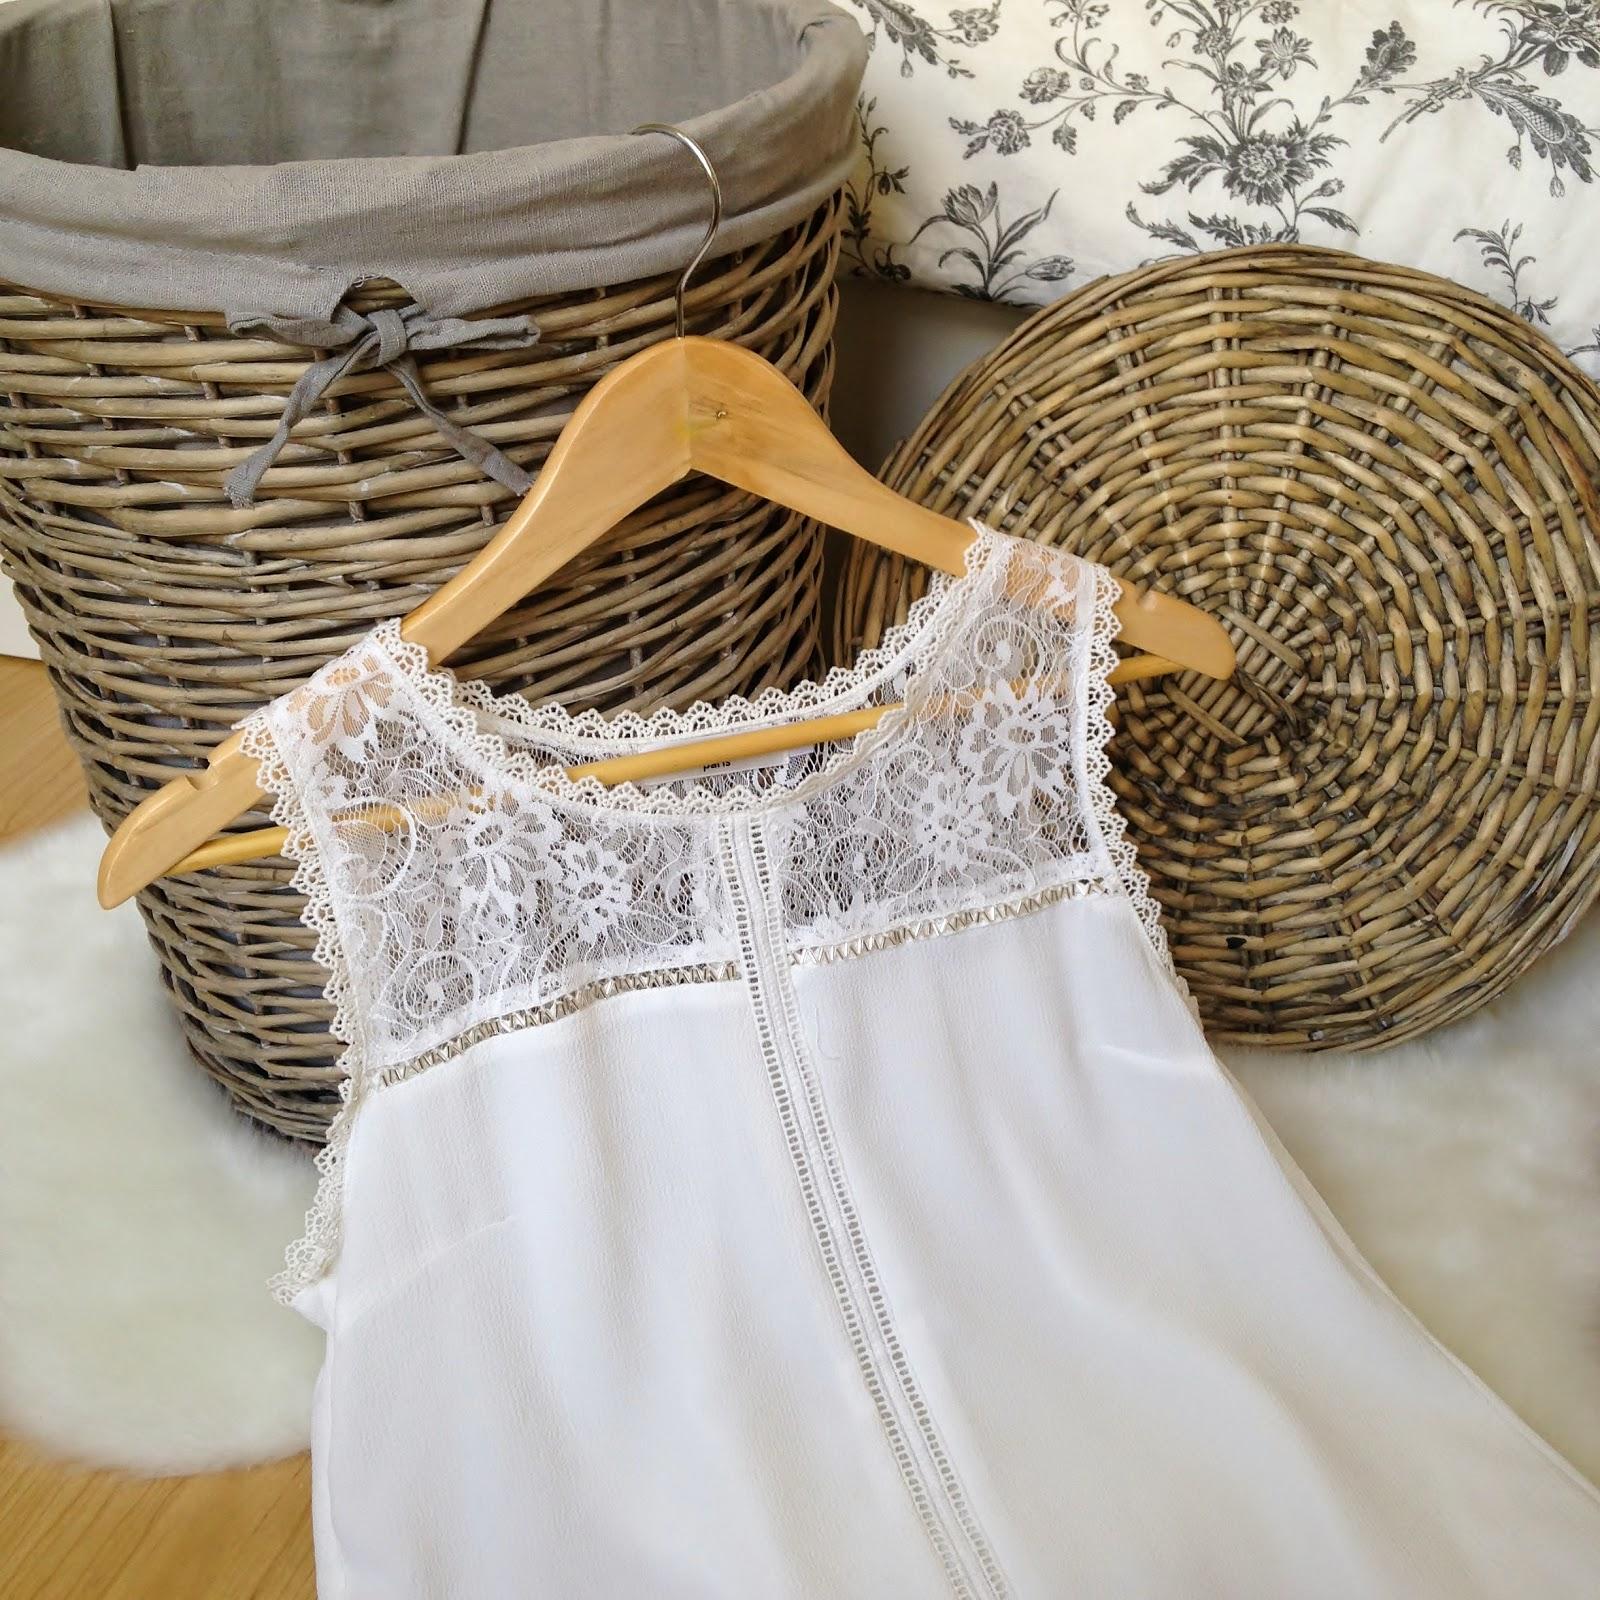 haul mode jeans industry zone d 39 achat pauline dress blog mode lifestyle et d co besan on. Black Bedroom Furniture Sets. Home Design Ideas